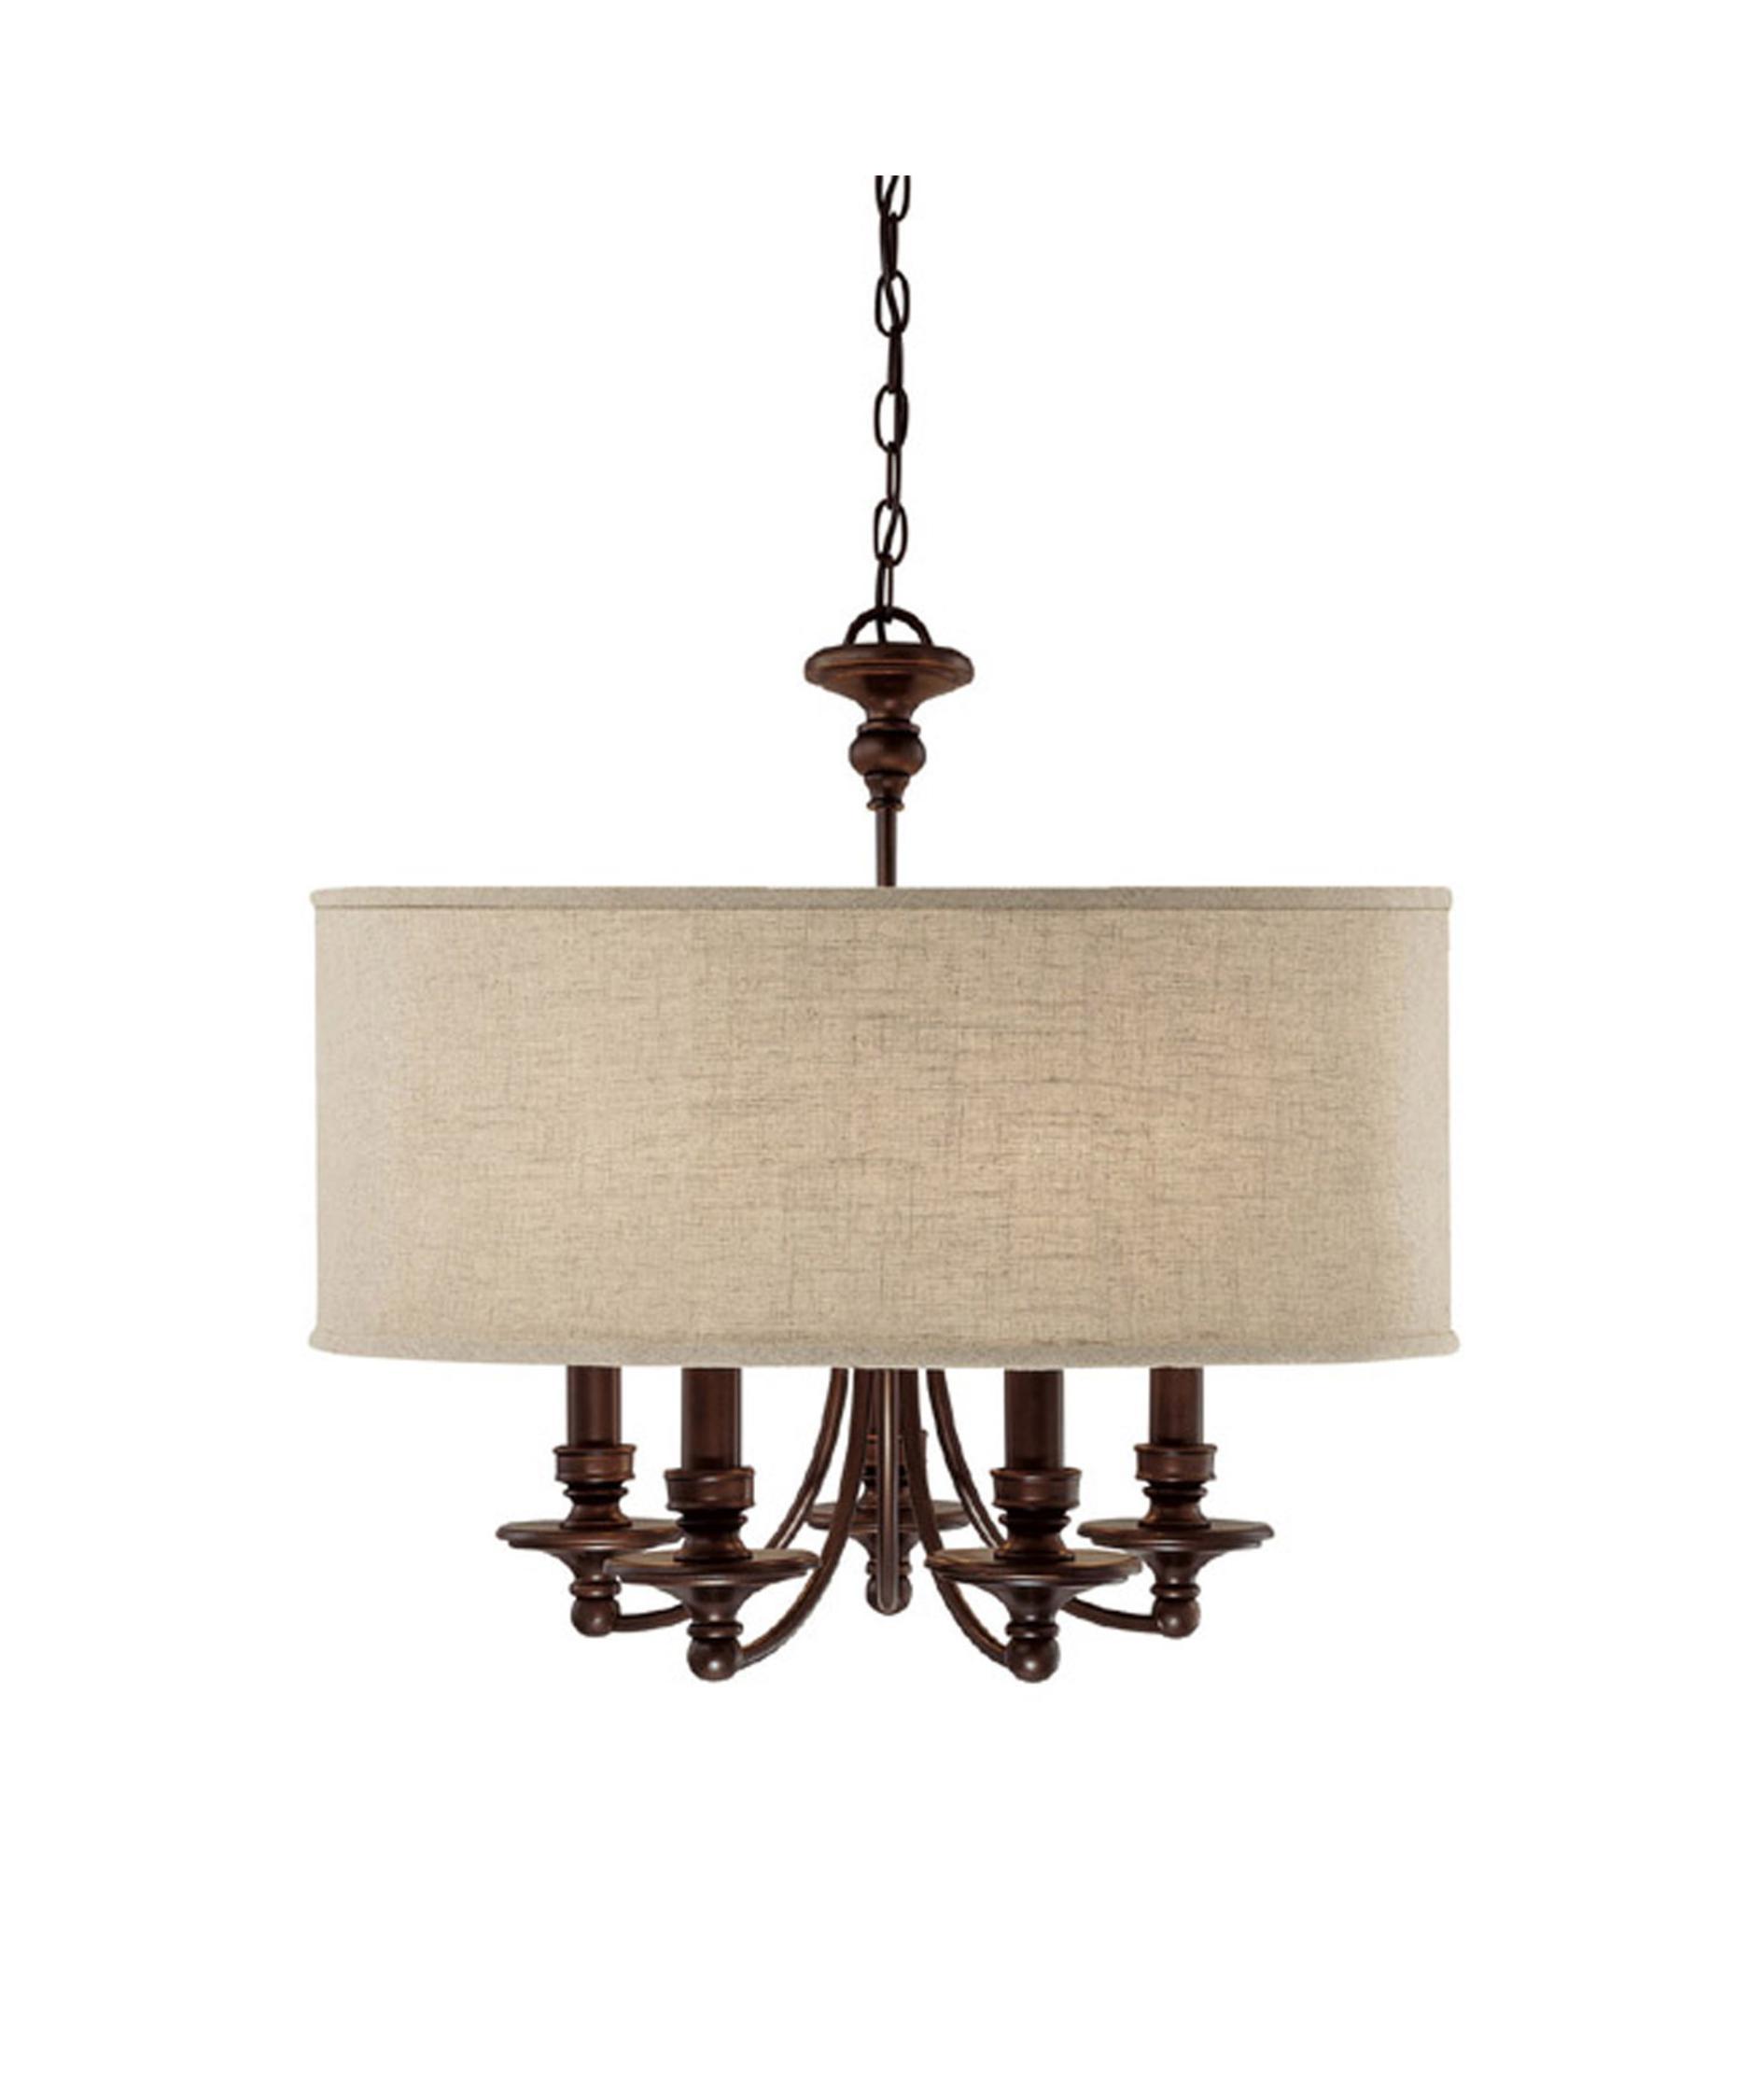 capital lighting midtown 25 inch wide 5 light chandelier capitol lighting - Capital Lighting